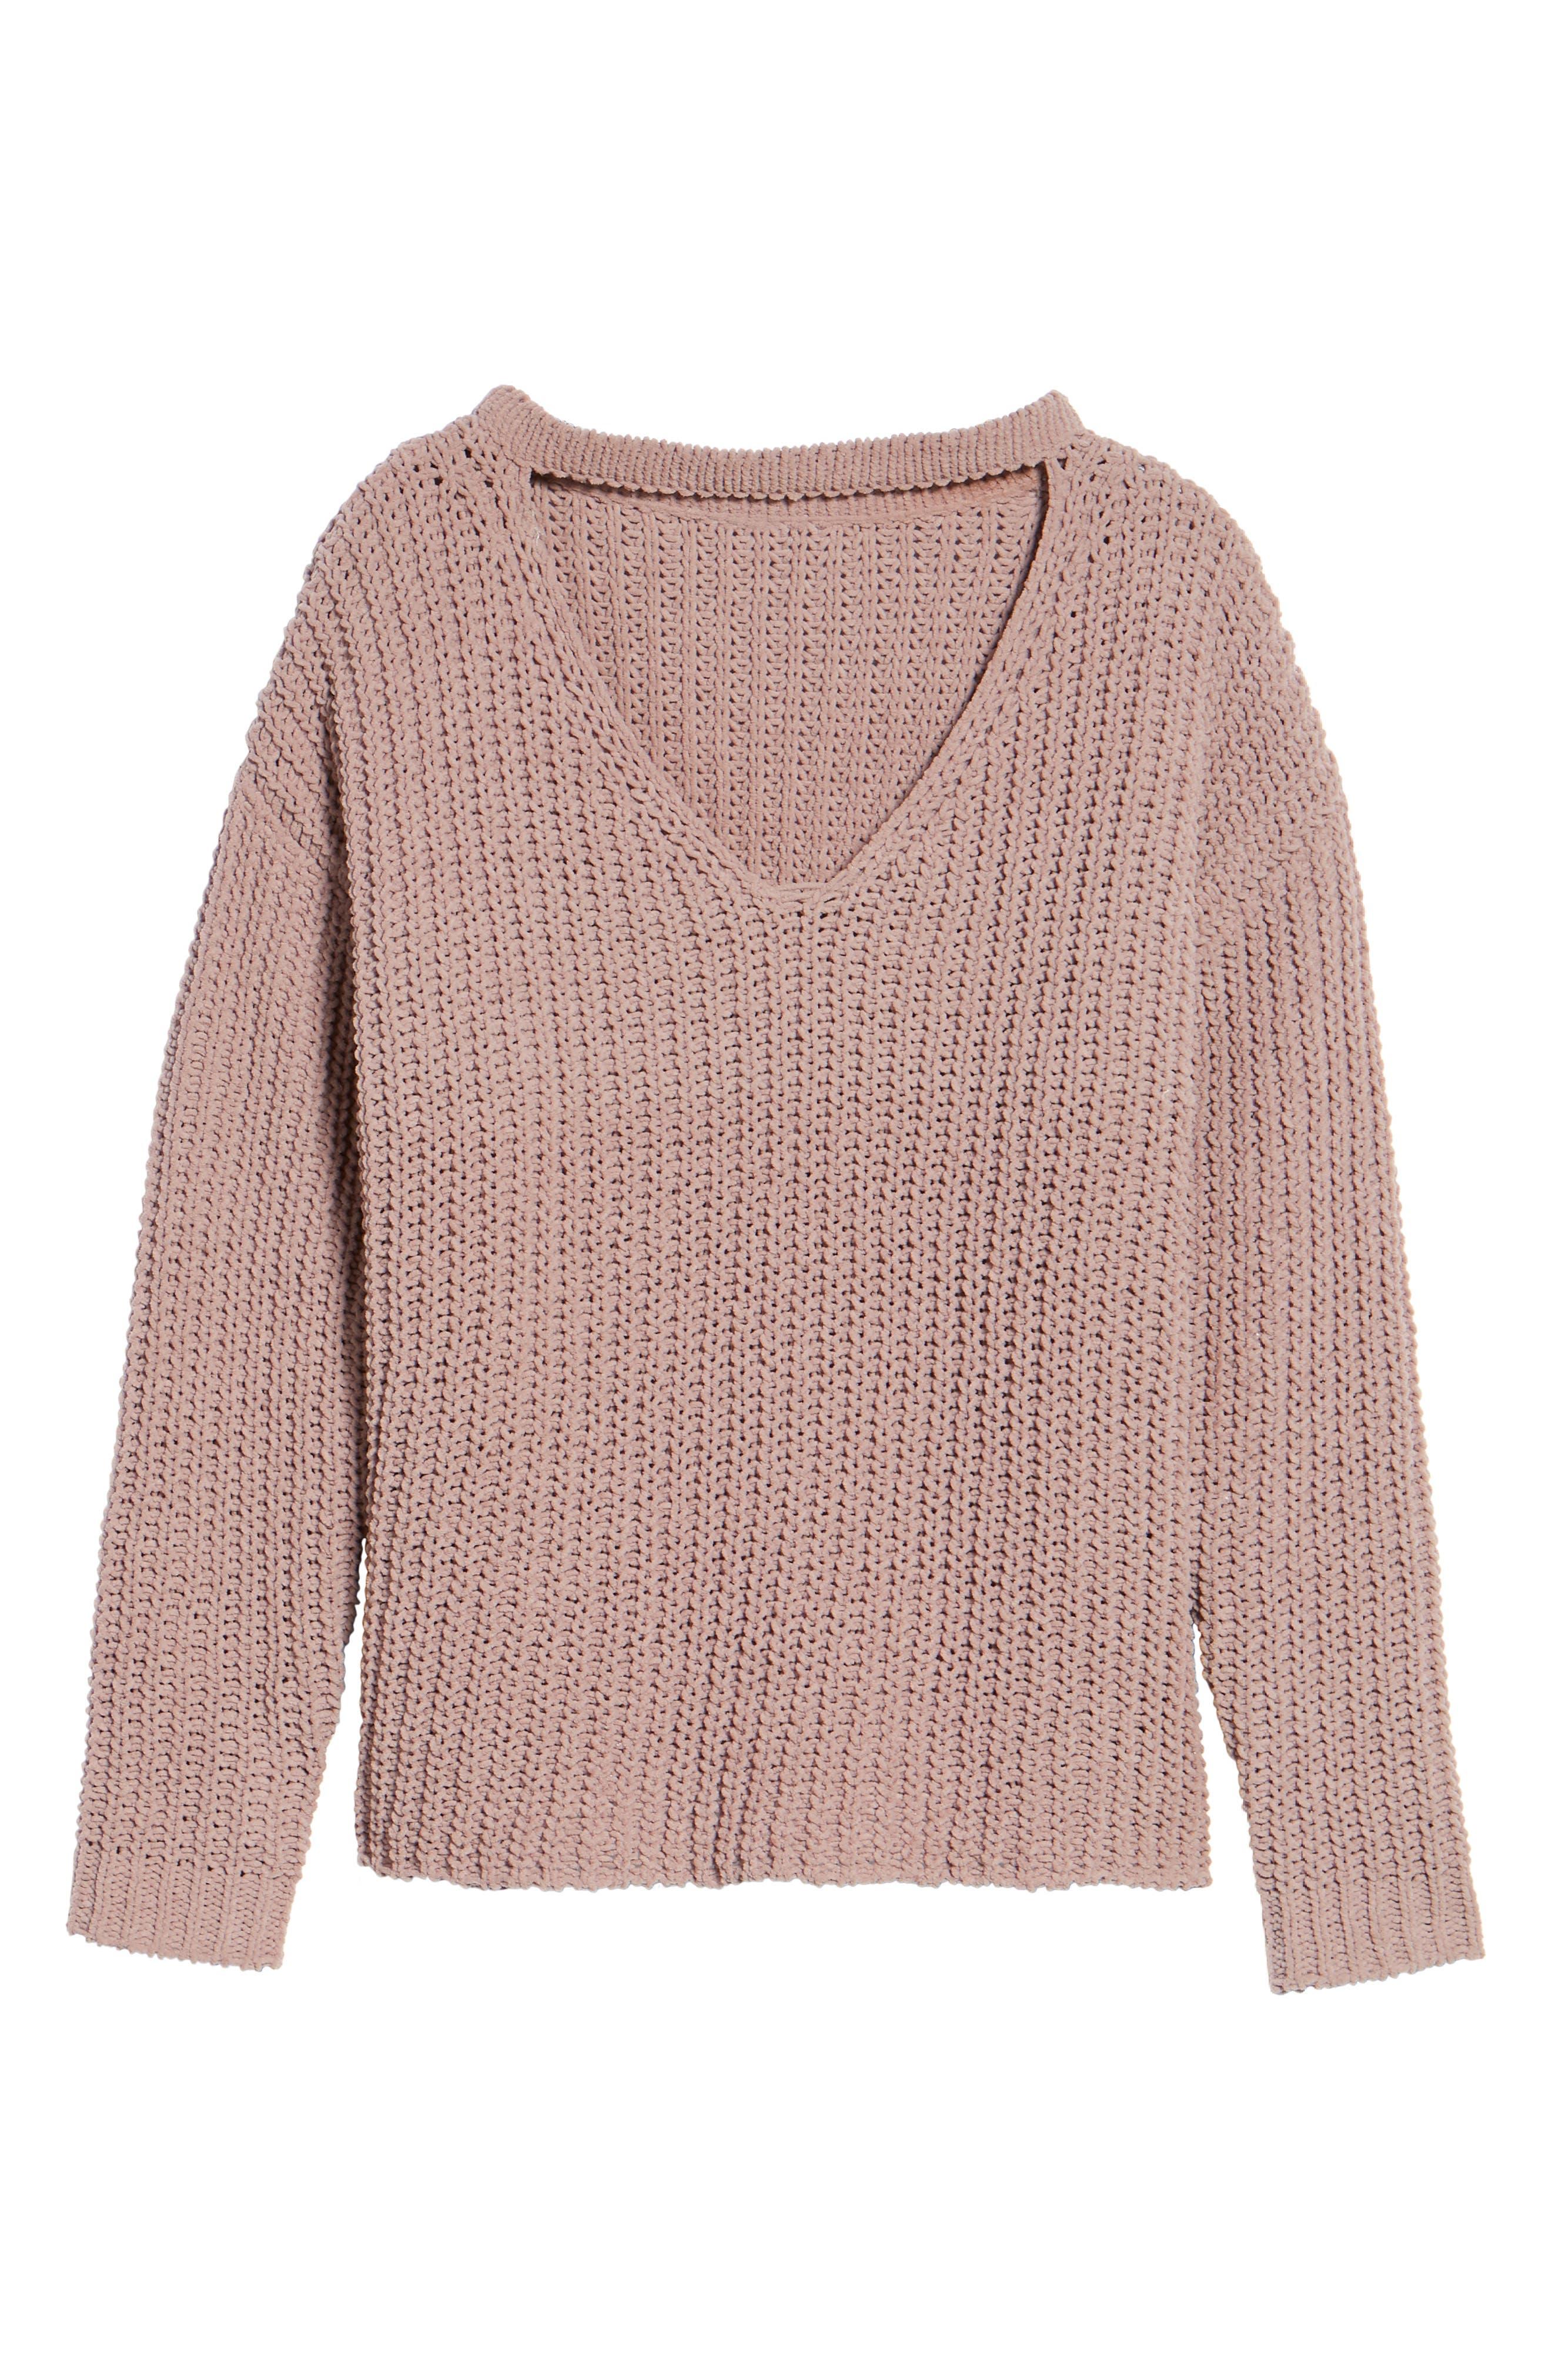 Mary Lous Choker Sweater,                             Alternate thumbnail 12, color,